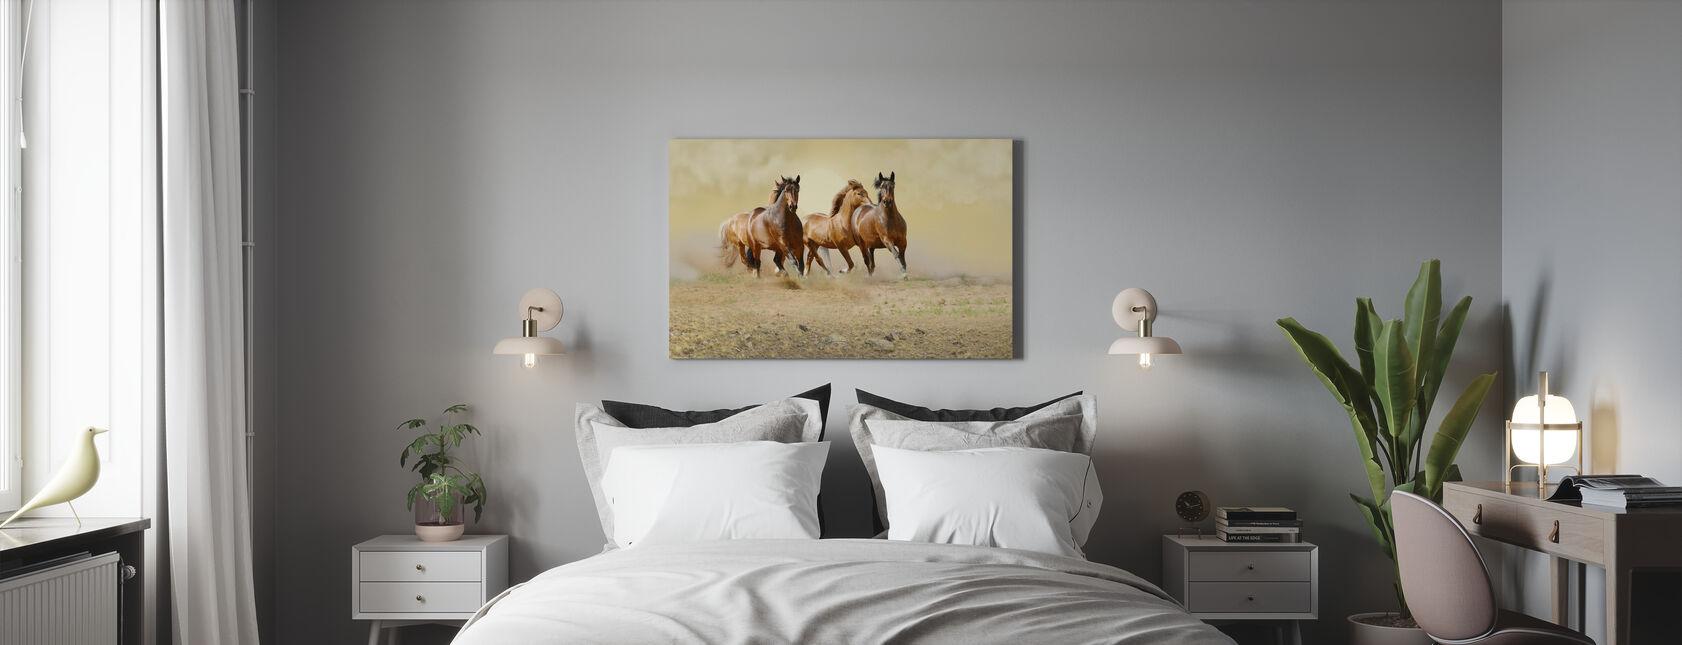 Wild Horses - Canvas print - Bedroom